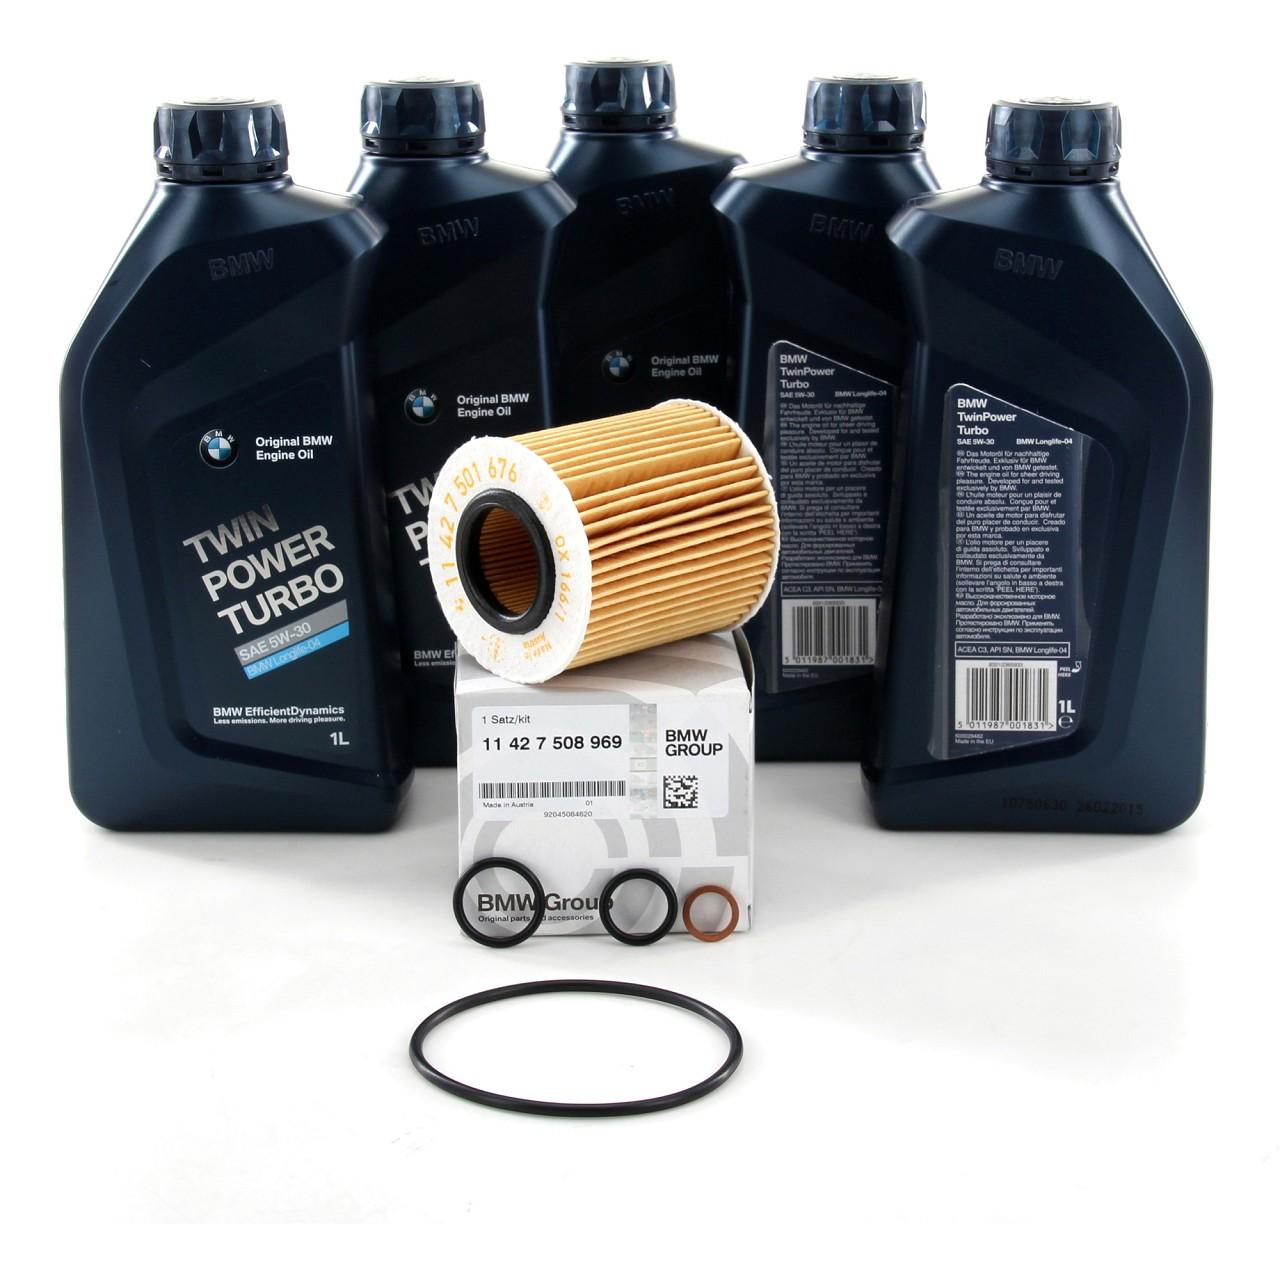 ORIGINAL BMW Motoröl Öl 5W30 LongLife-04 5 Liter + Ölfilter 11427508969